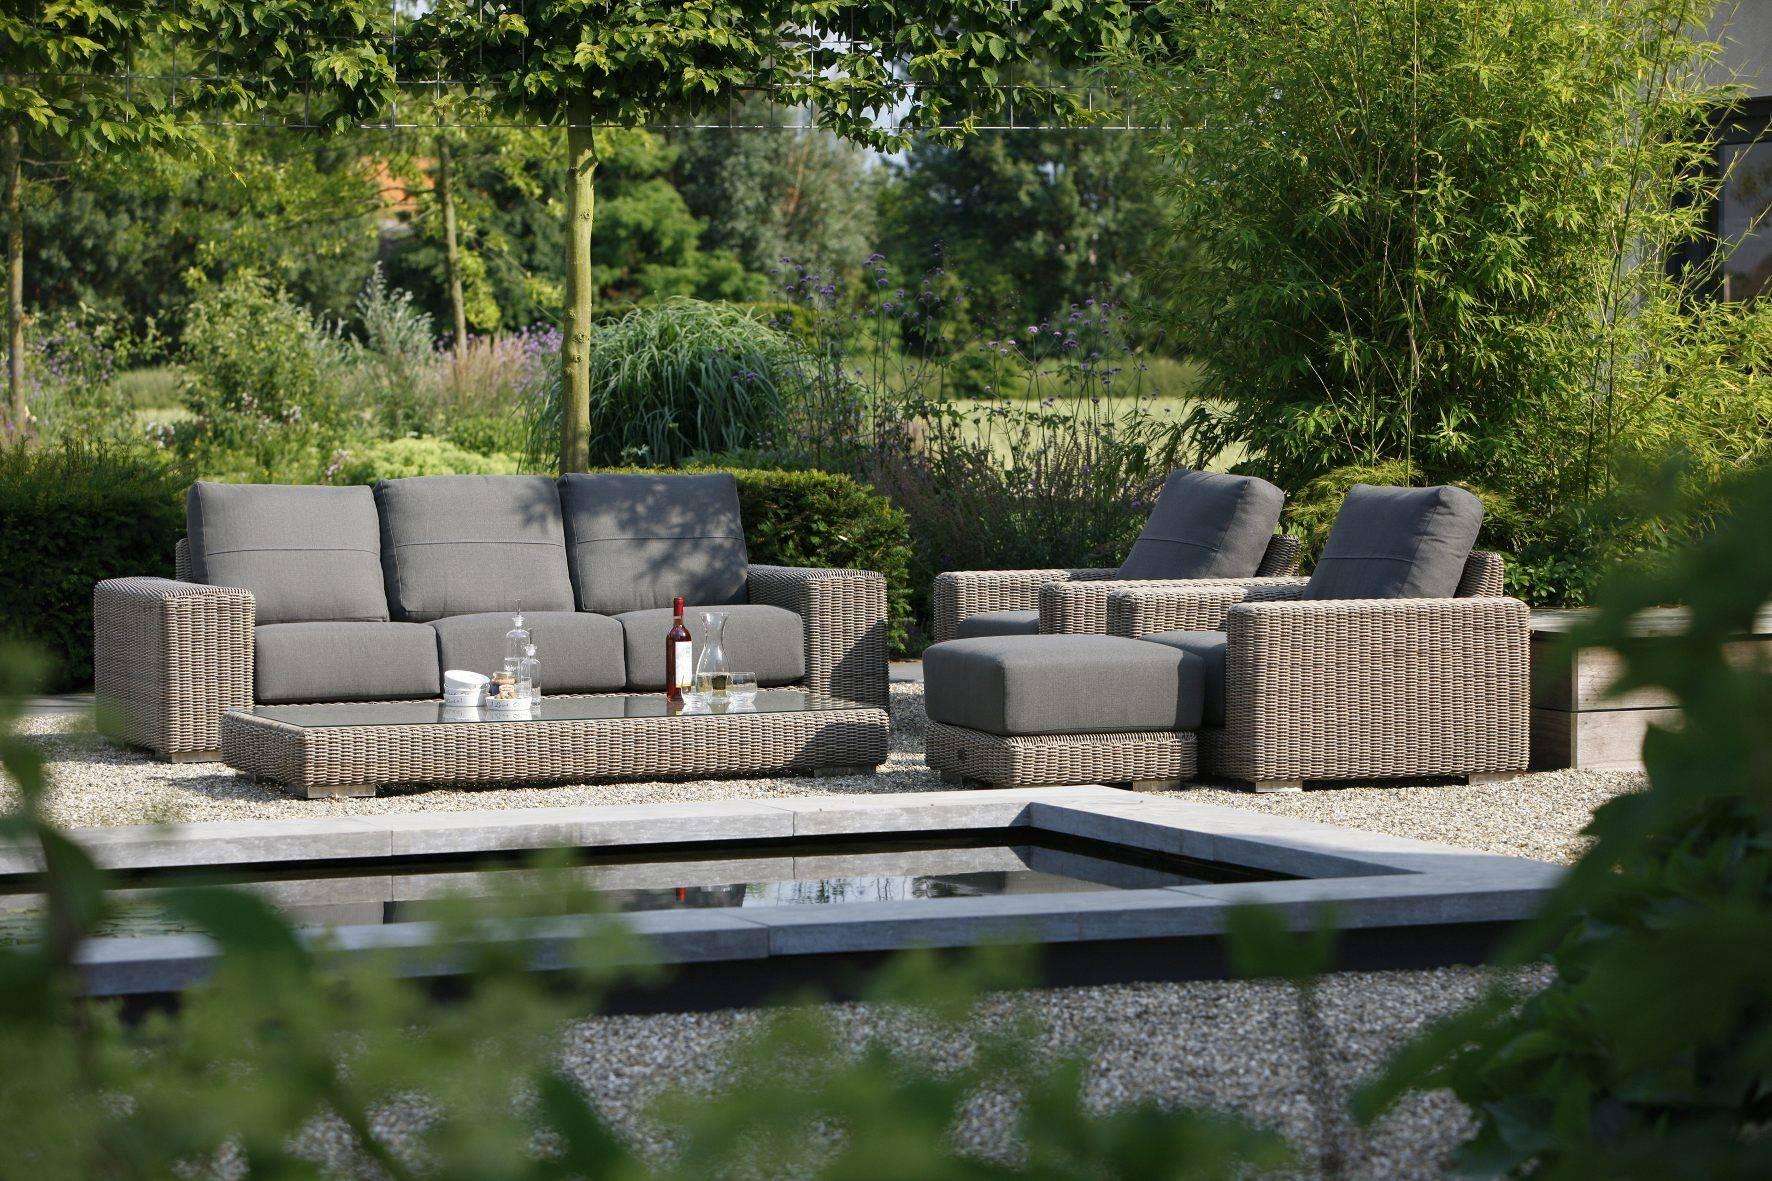 Outdoor Living Furniture - Luxury Garden Furniture - LuxDeco.com